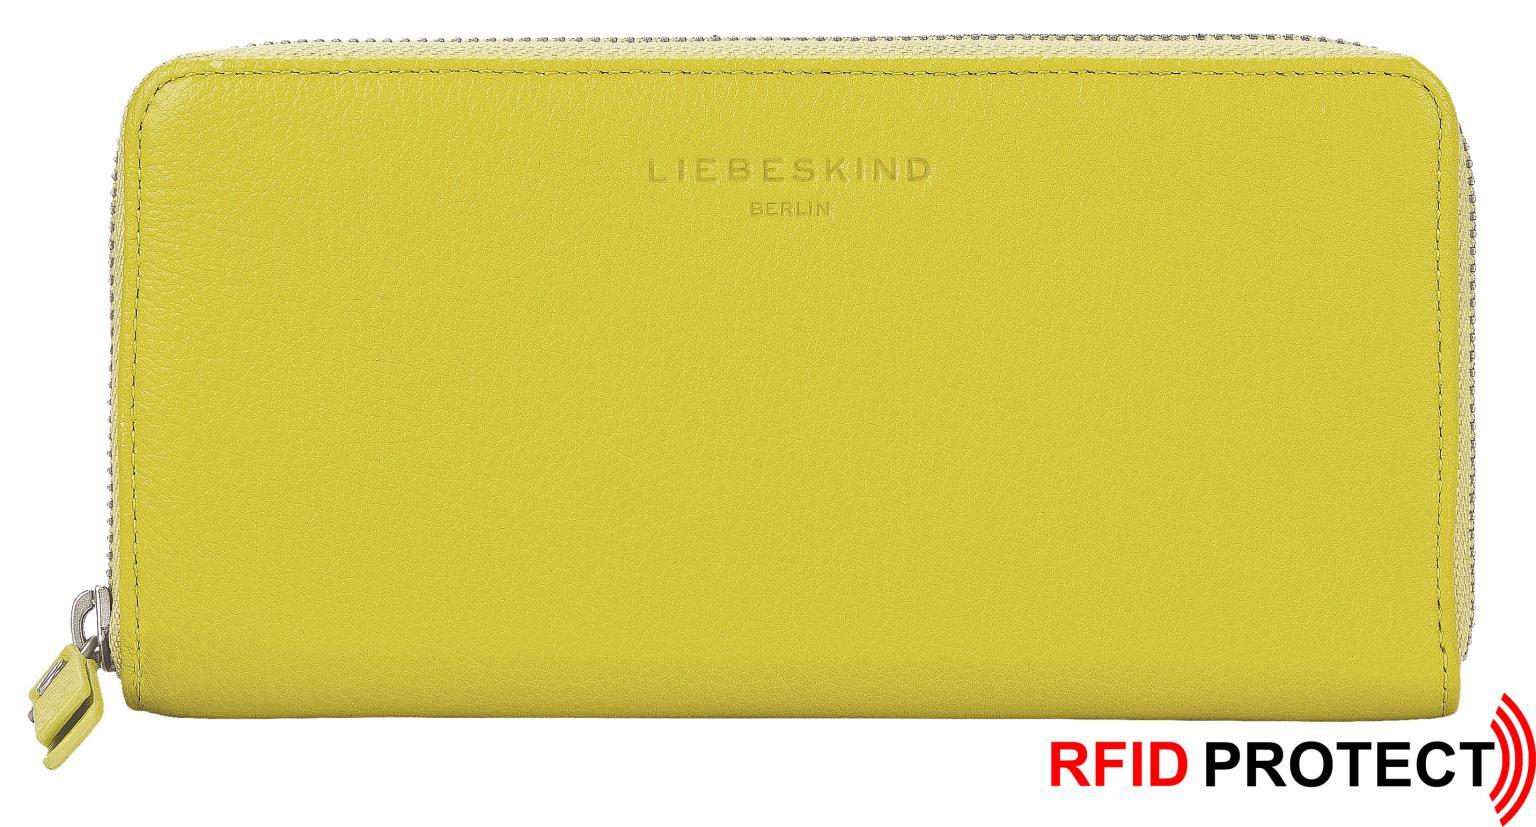 Langbörse zitronengelb Liebeskind Gigi RFID Ziparound Lime Harri